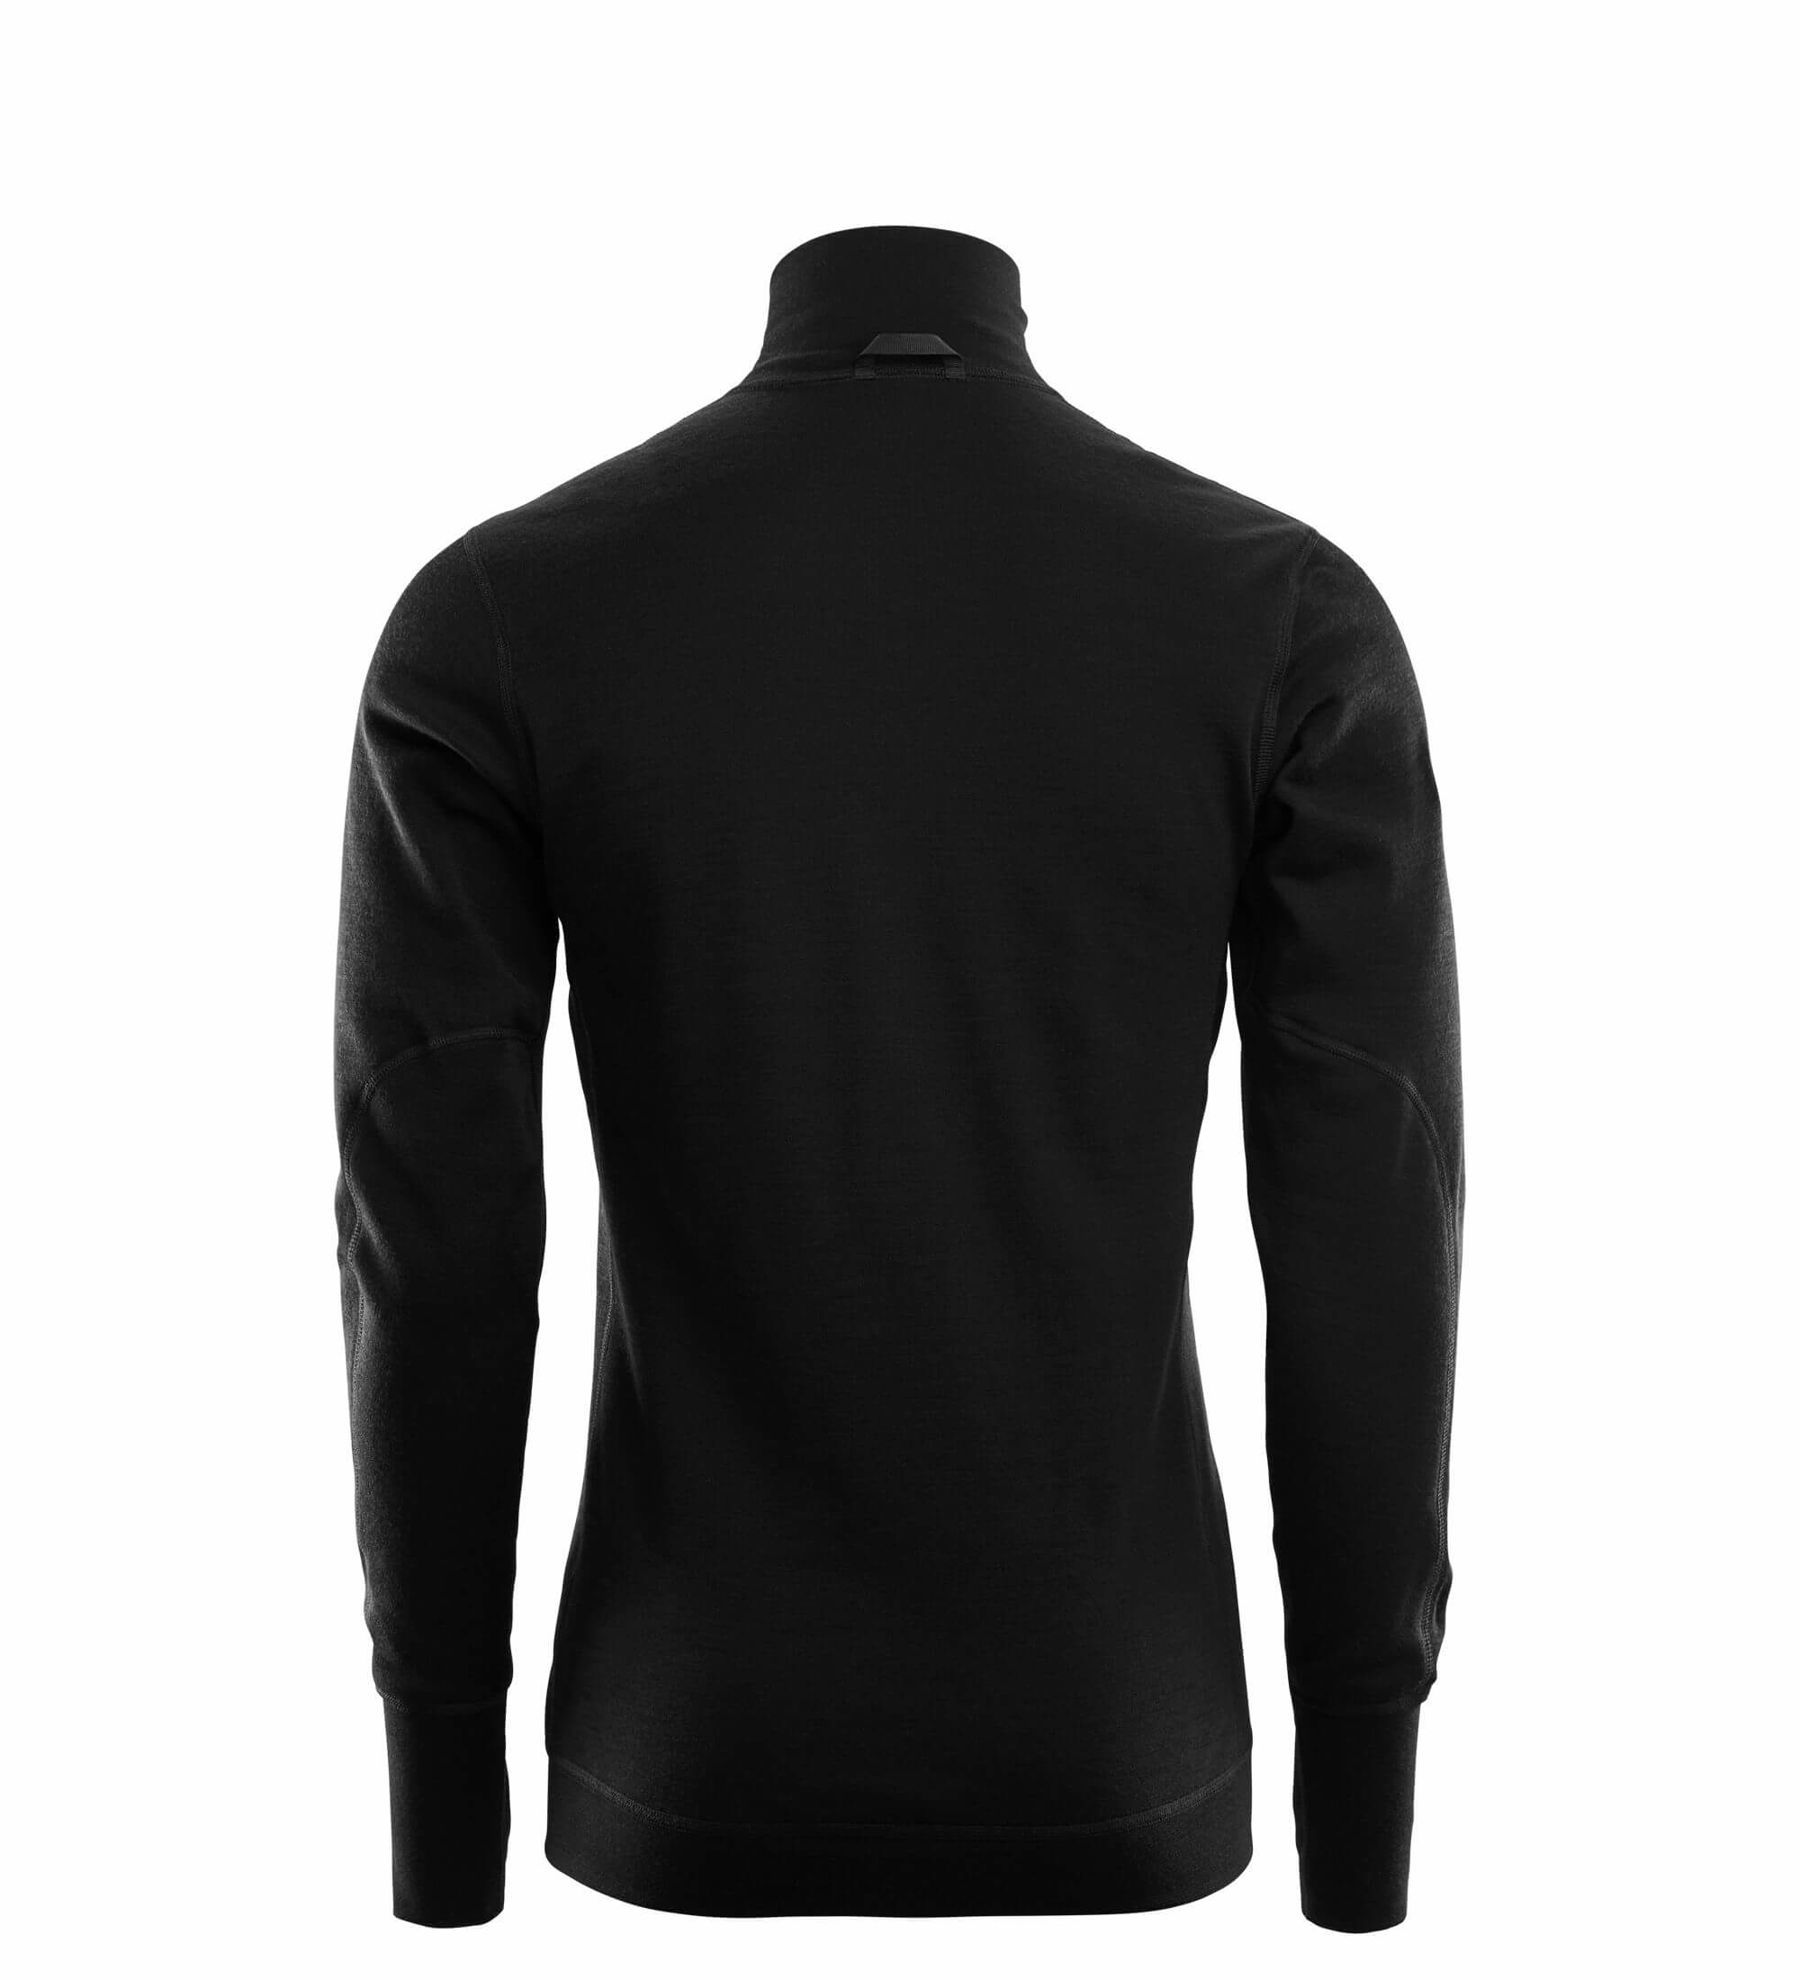 Bilde av DoubleWool Polo Shirt zip, Man